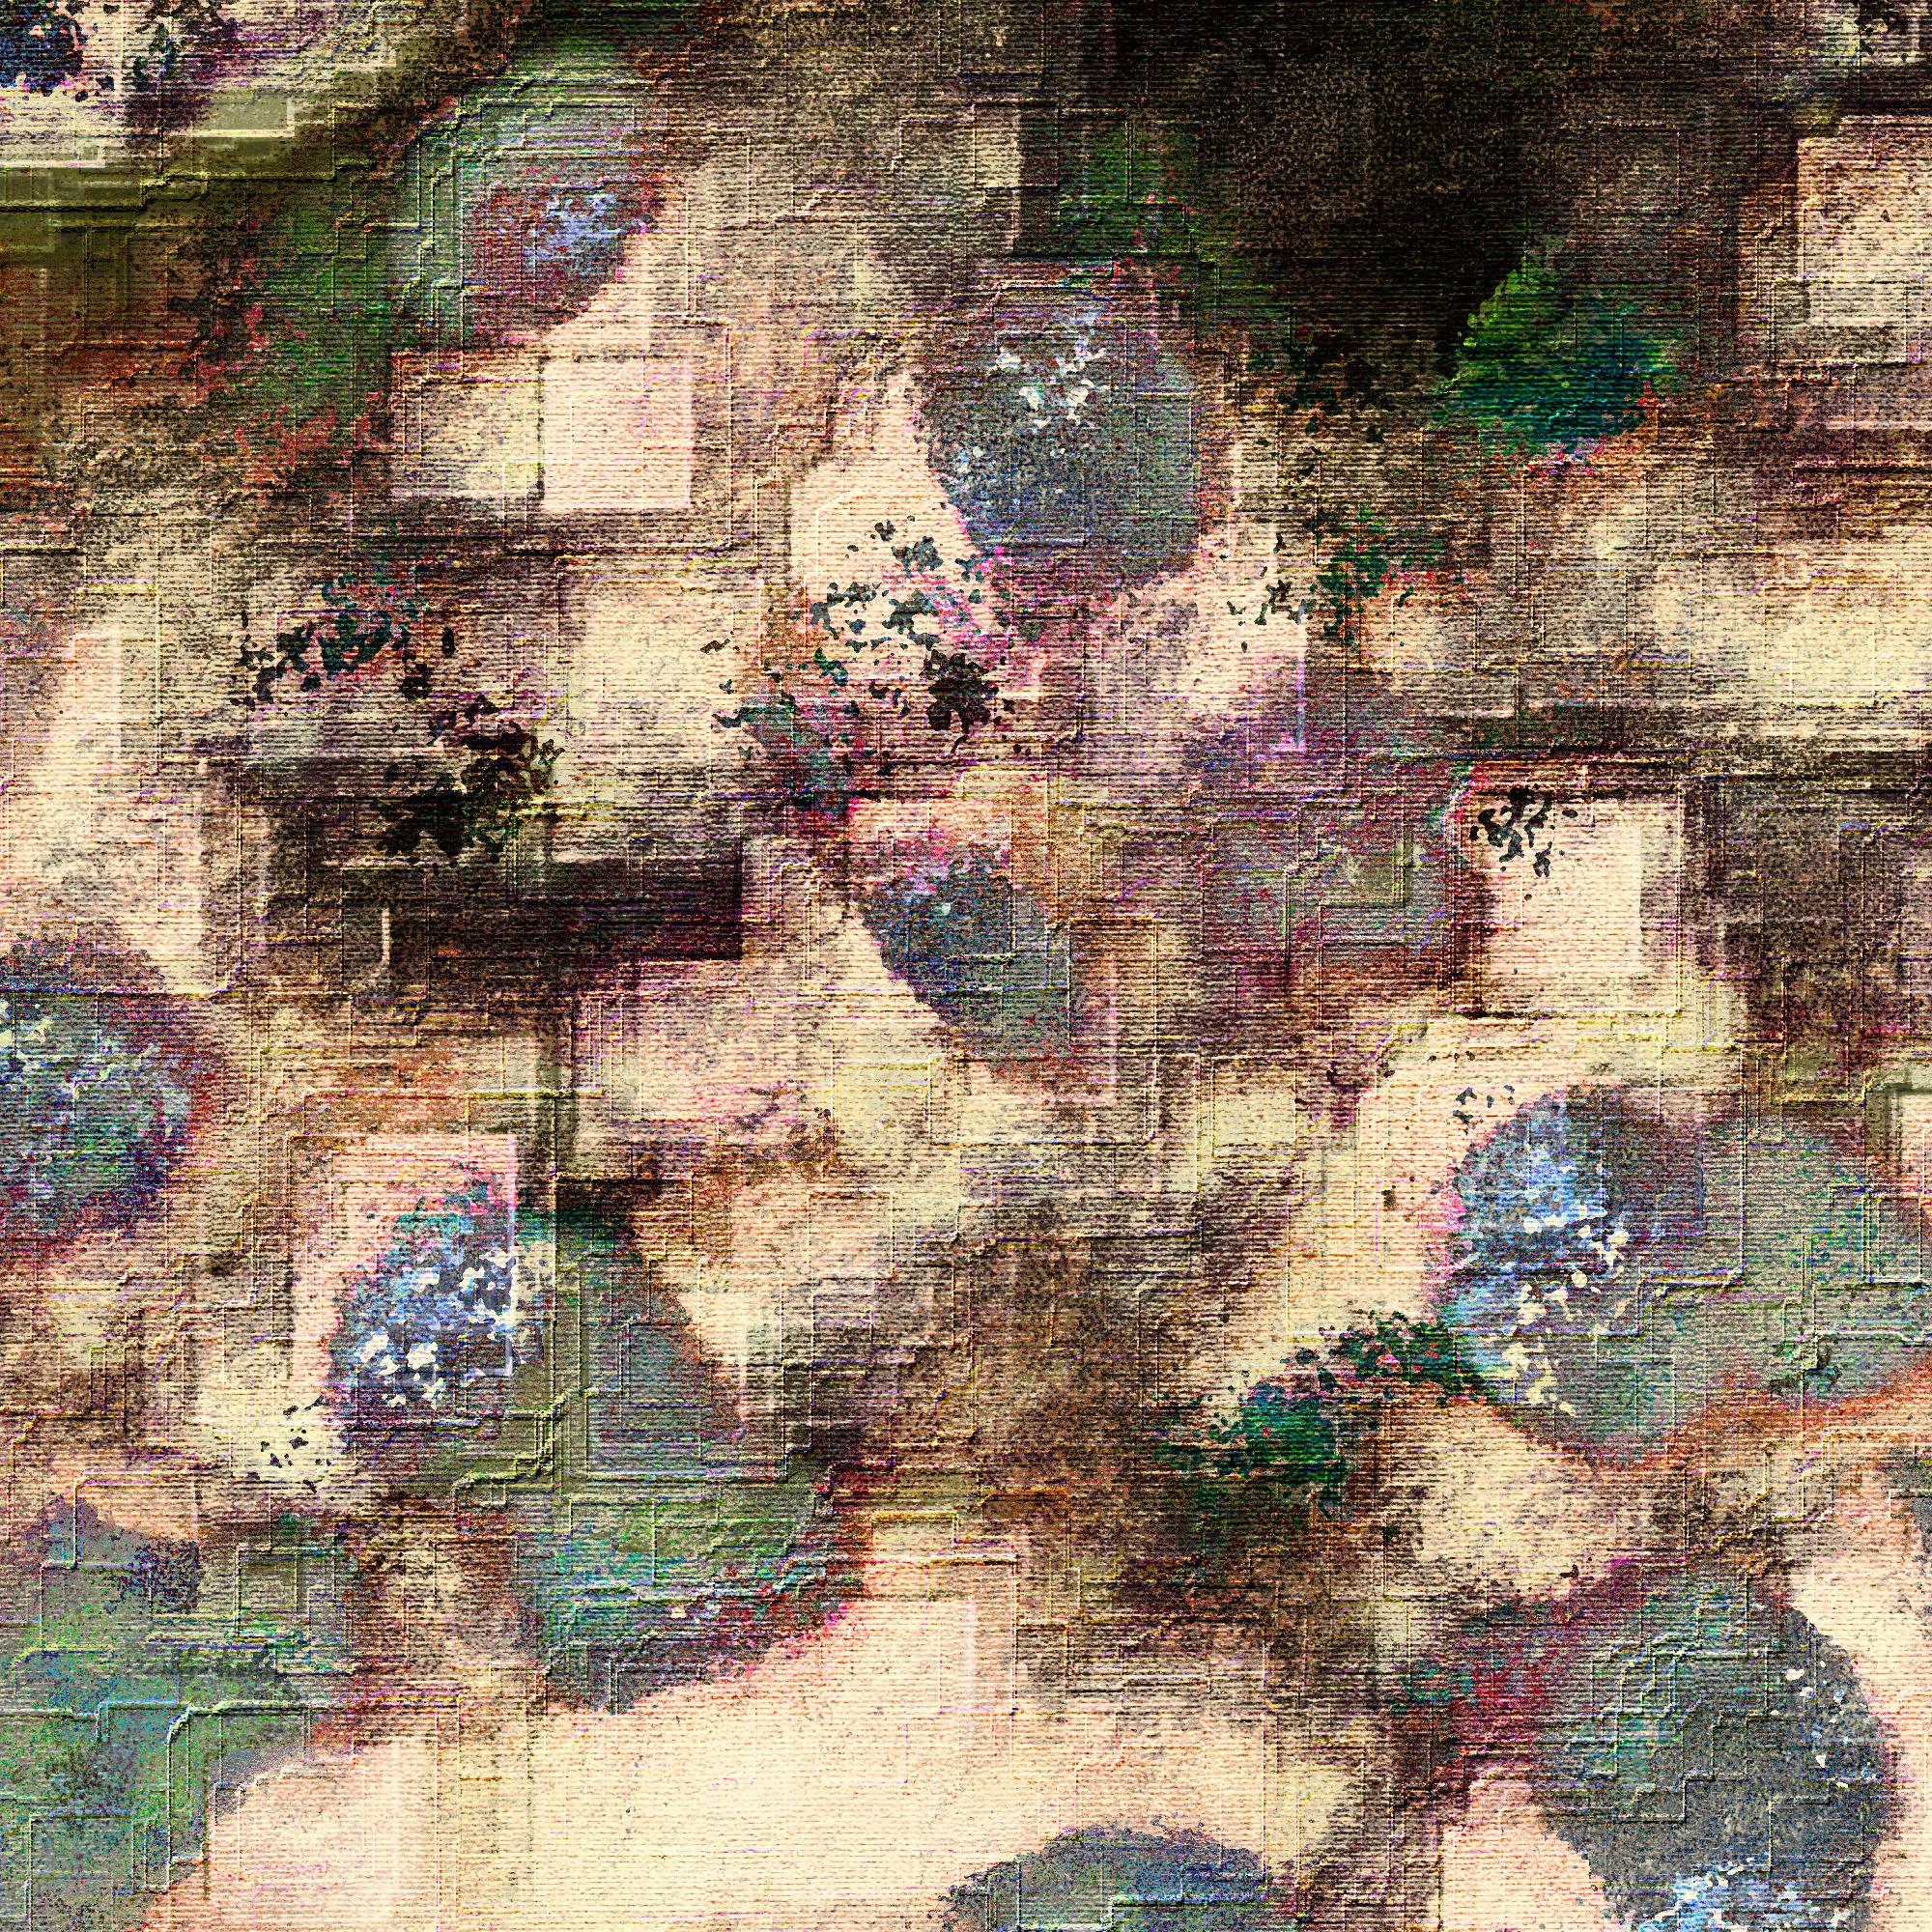 181207_Salt_Detail4.jpg